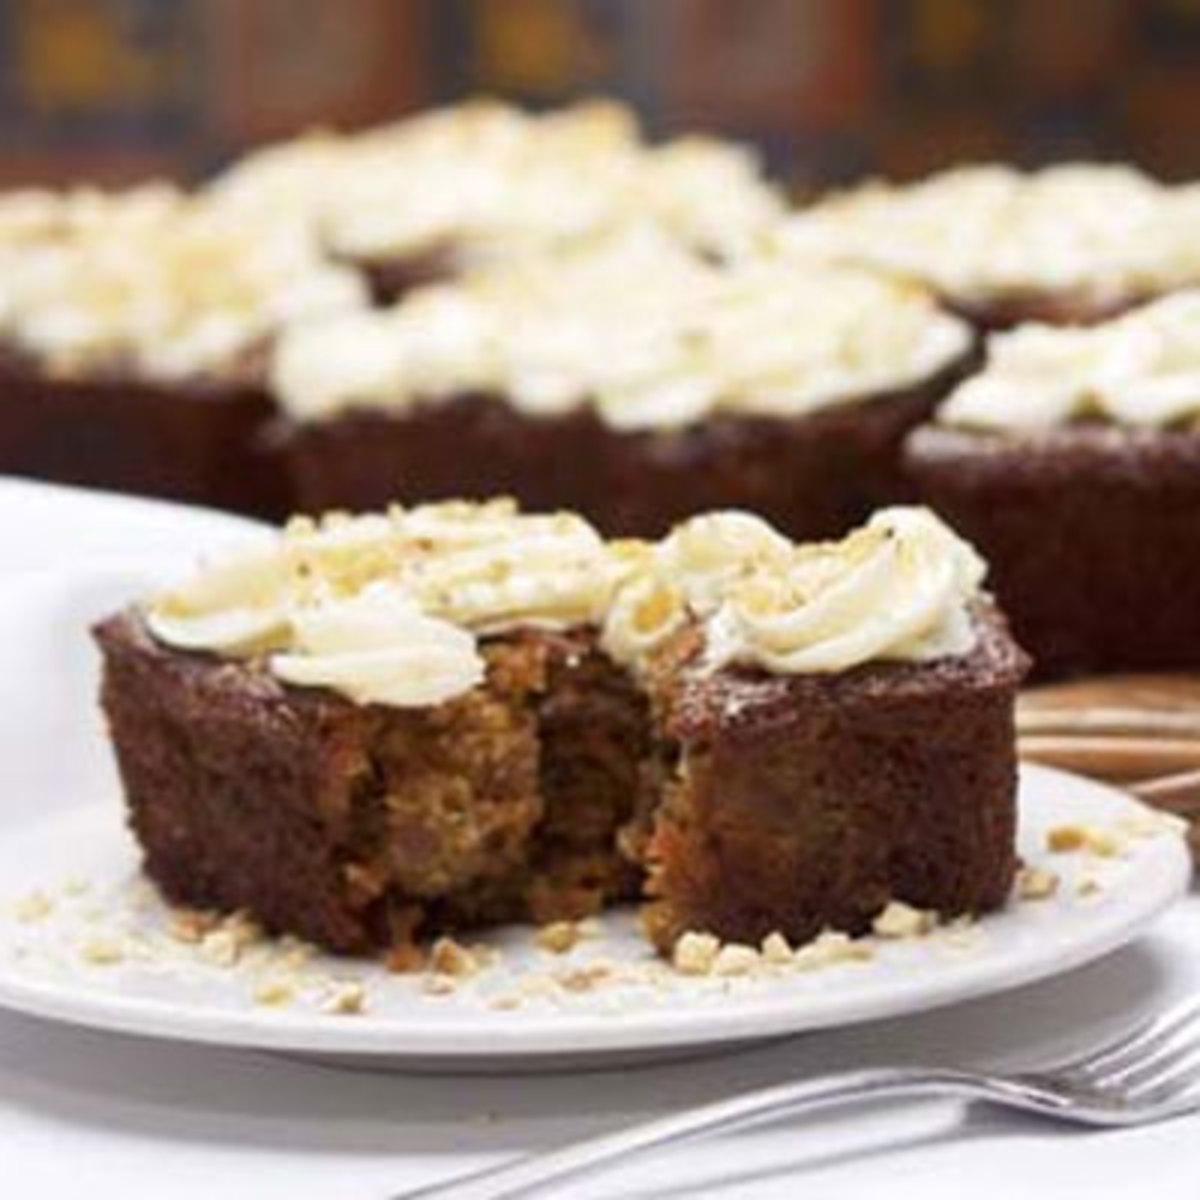 La Brea Carrot-Raisin Baby Cakes